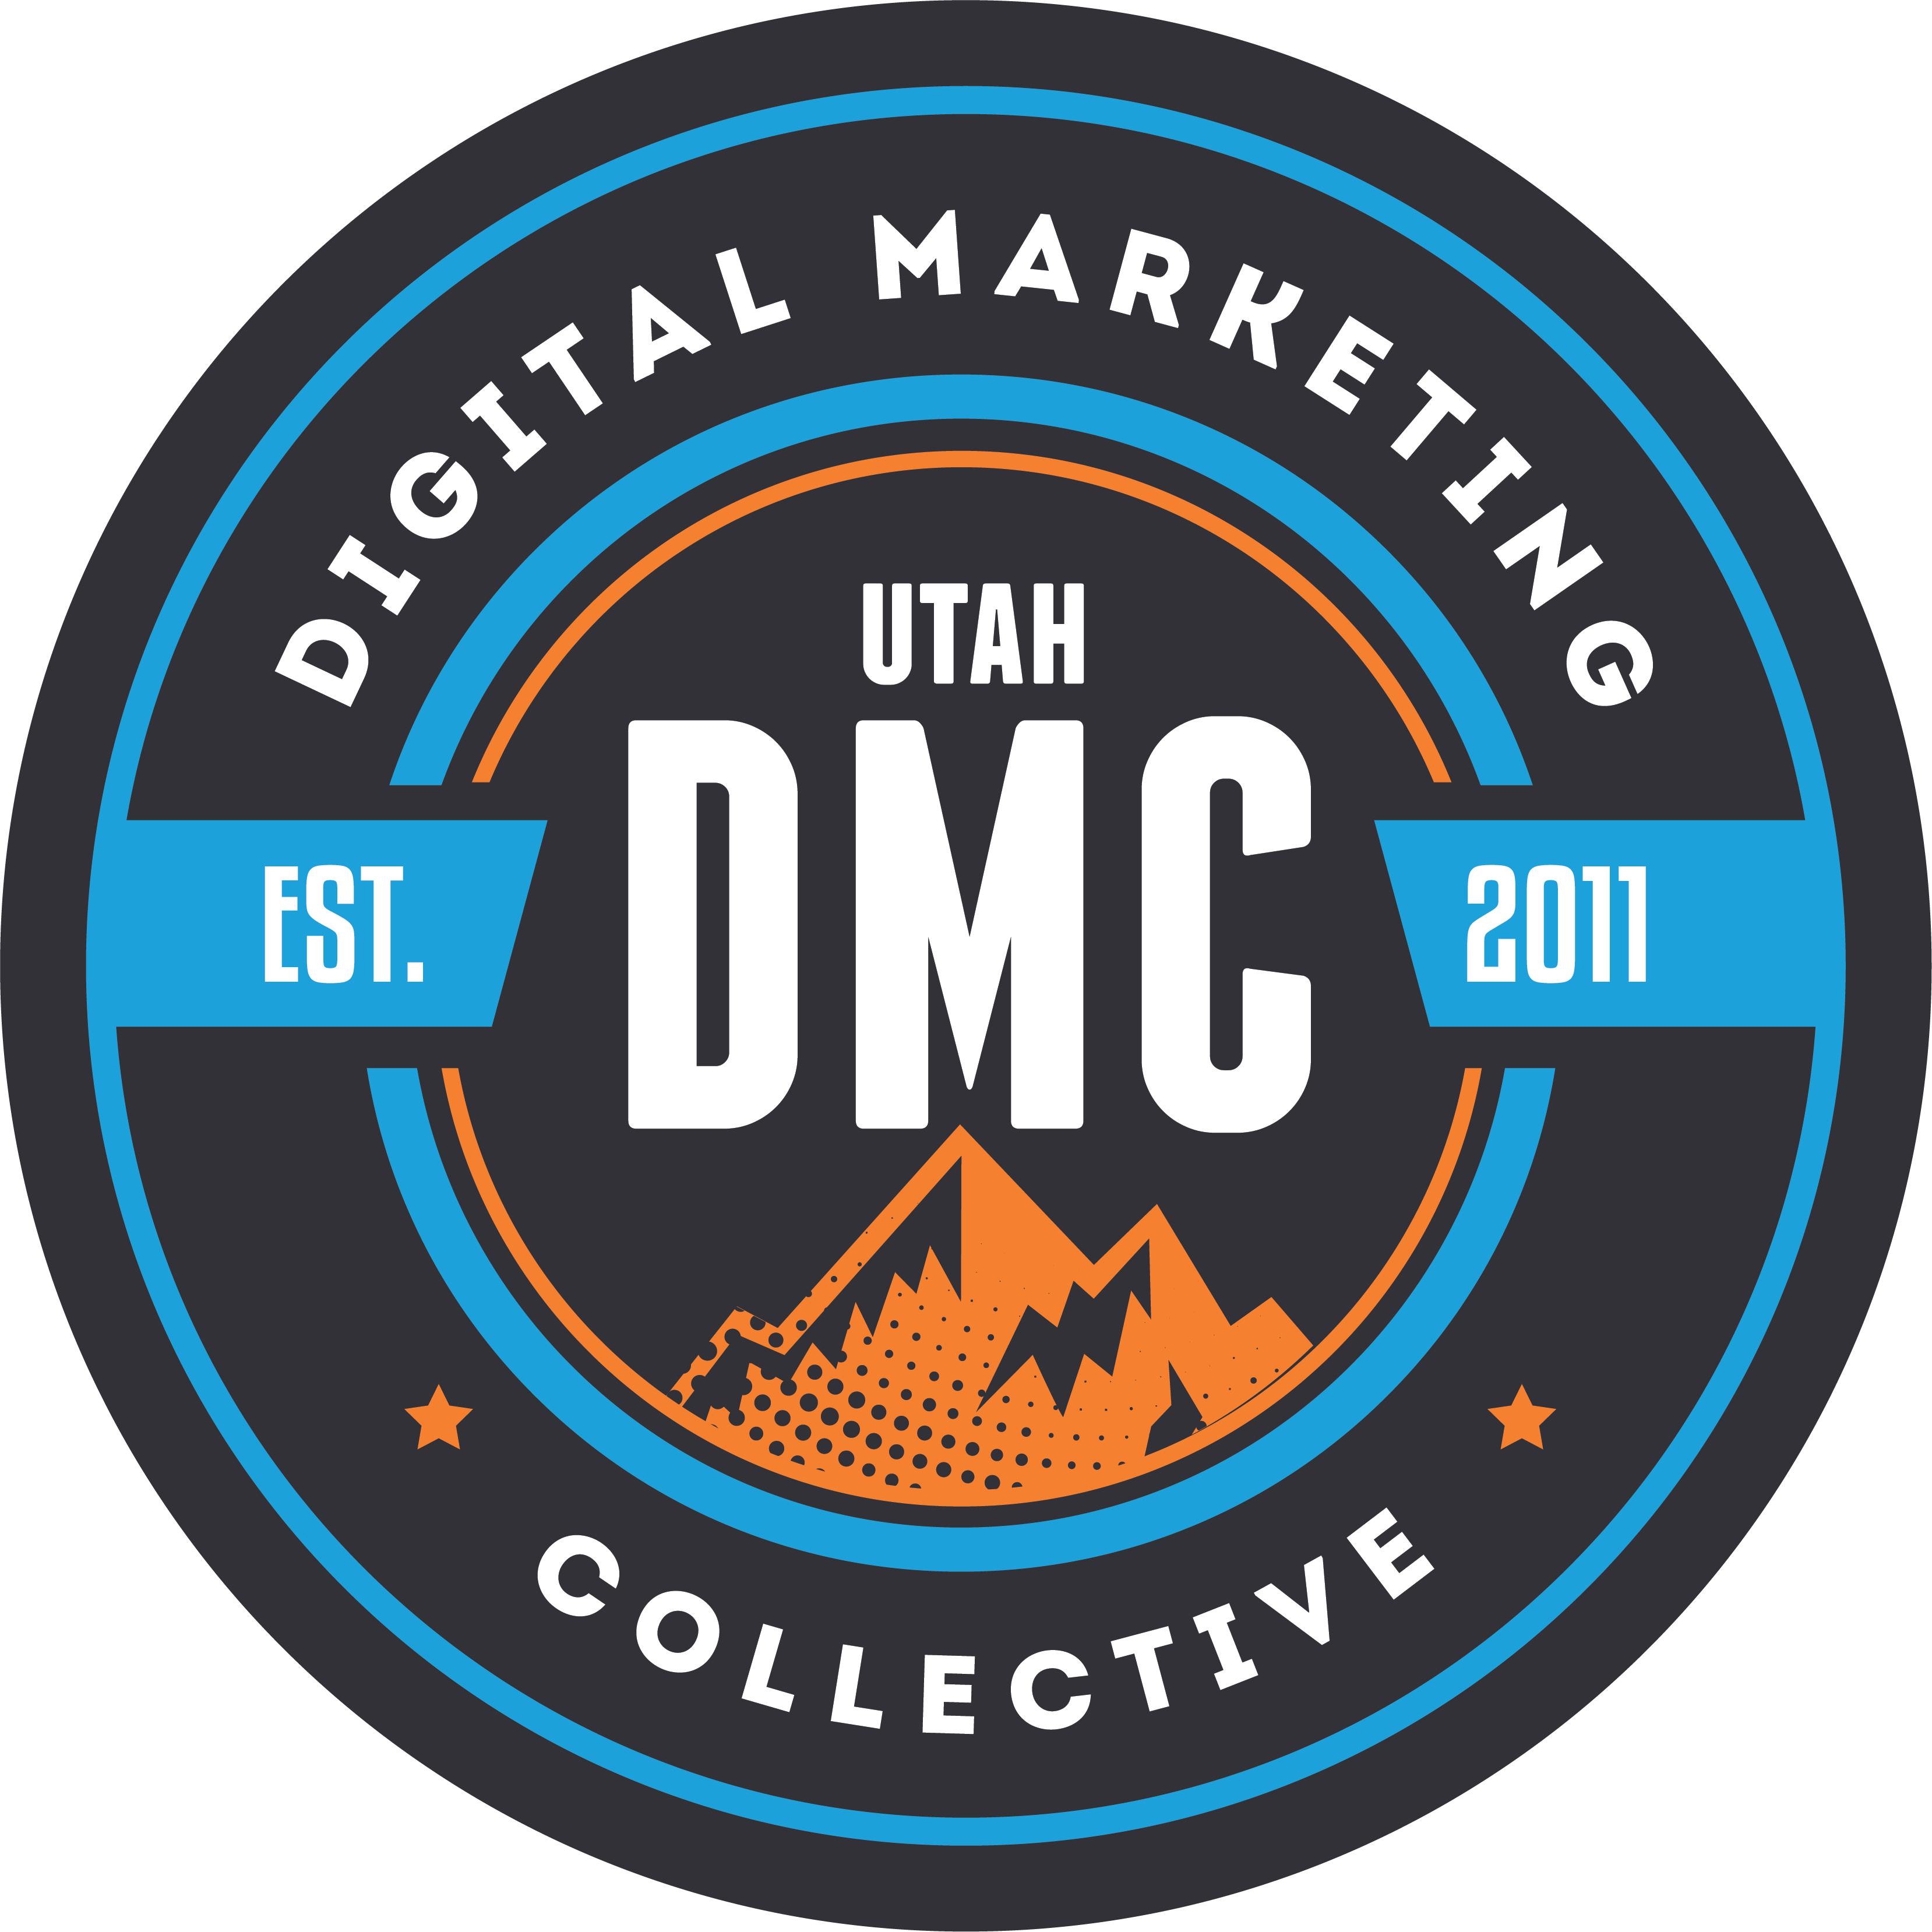 Utah Digital Marketing Collective